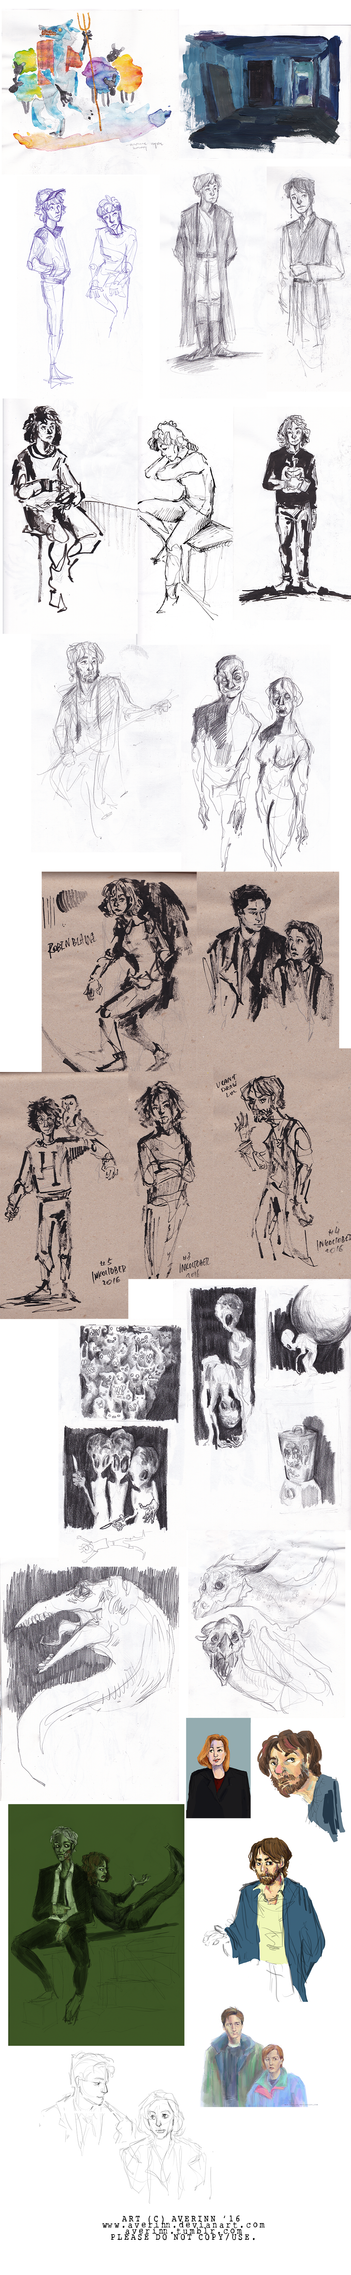 Sketchdump 004 by Averinn